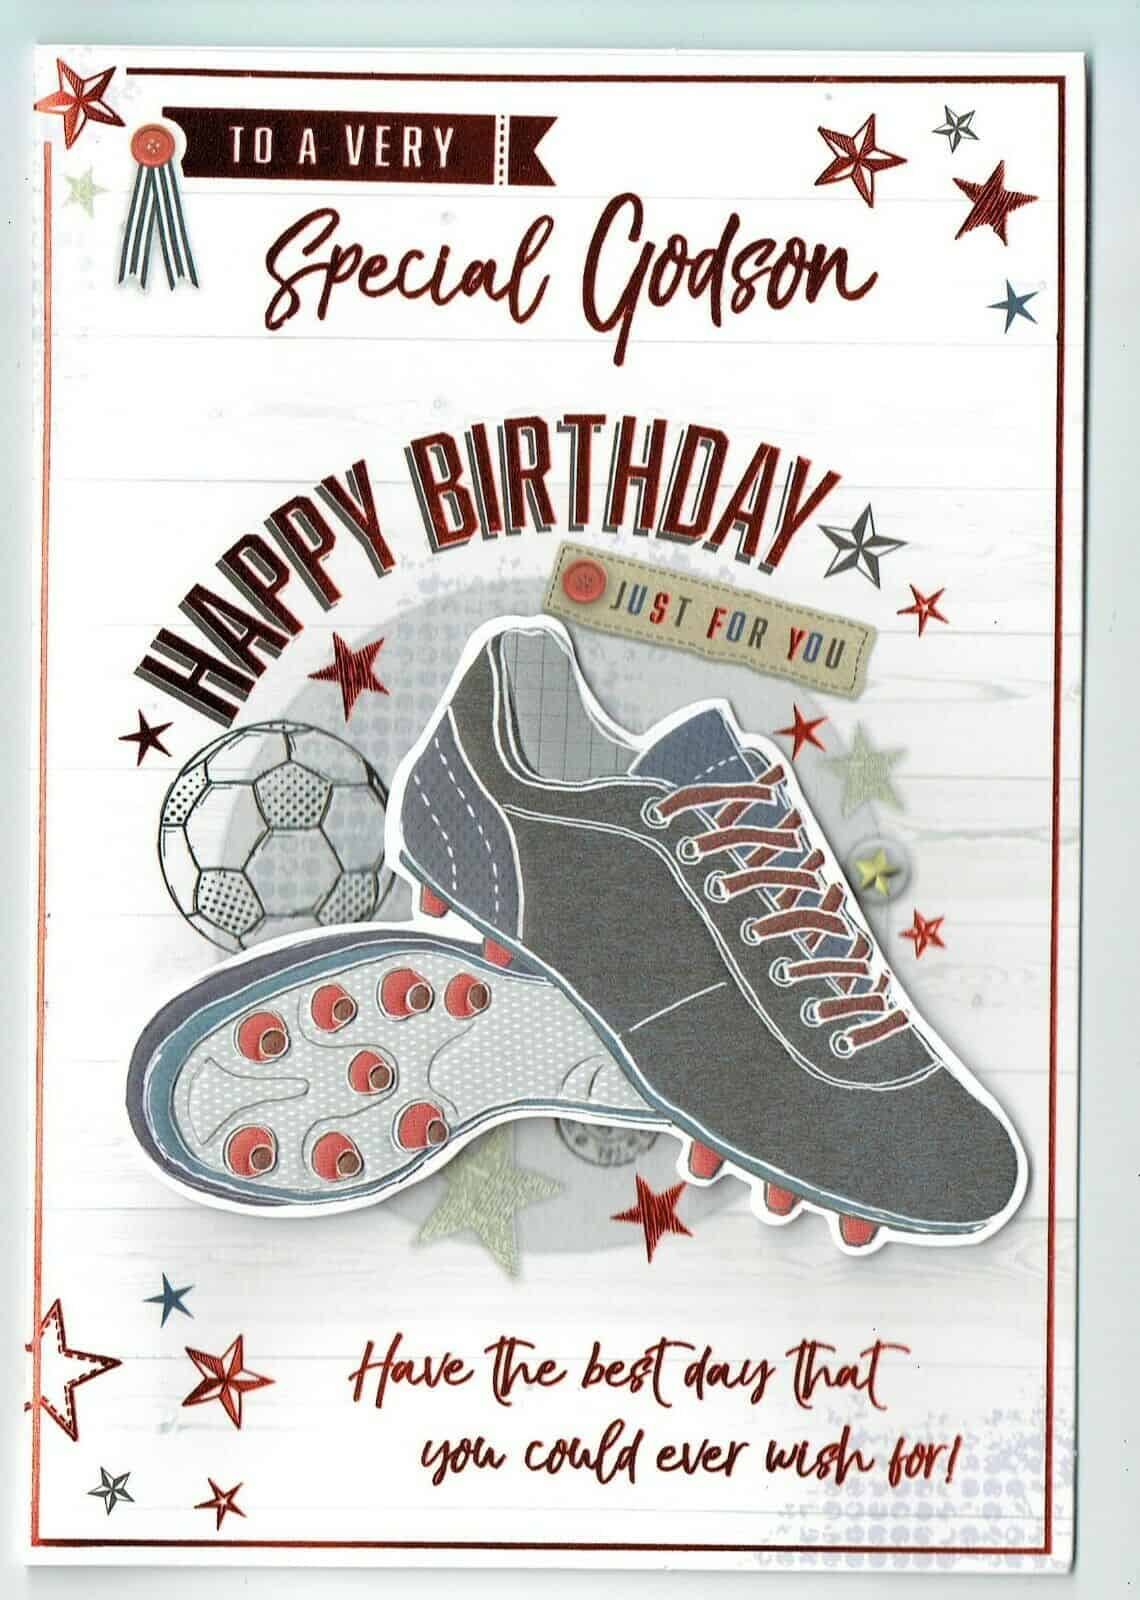 Godson Birthday Card TO A VERY SPECIAL GODSON